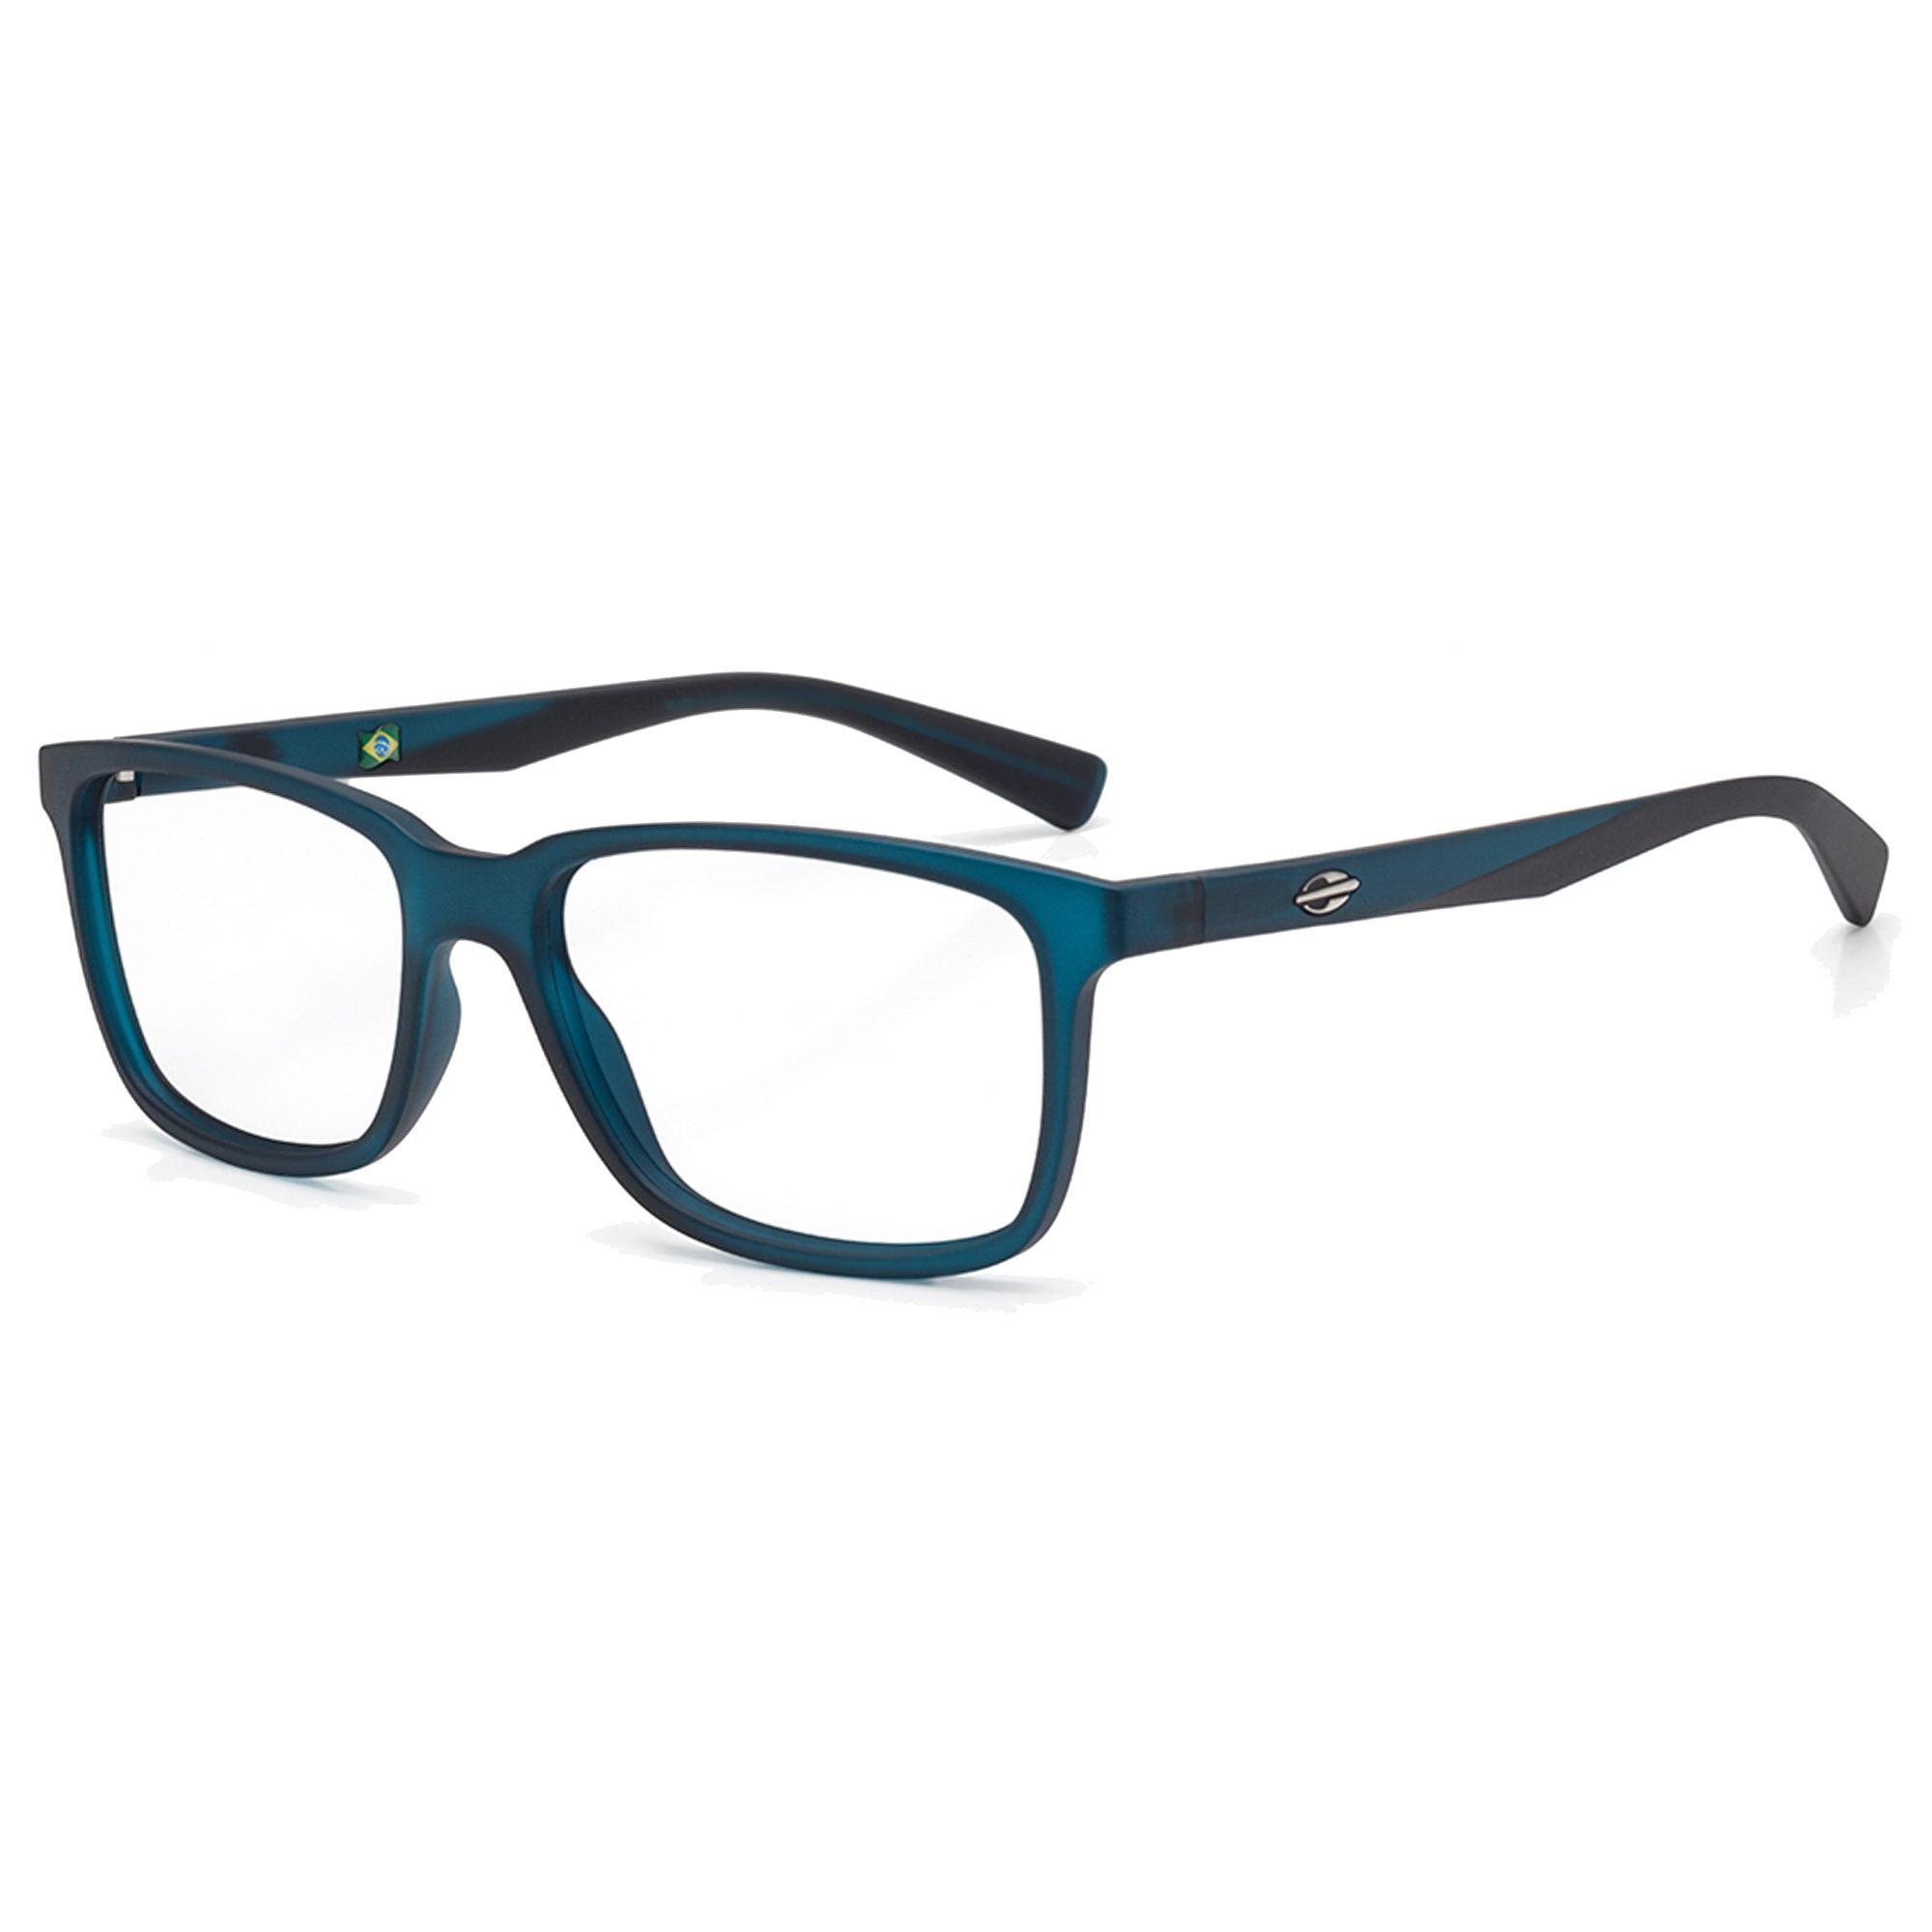 Óculos de Grau Unissex Mormaii Manila M6058K7754